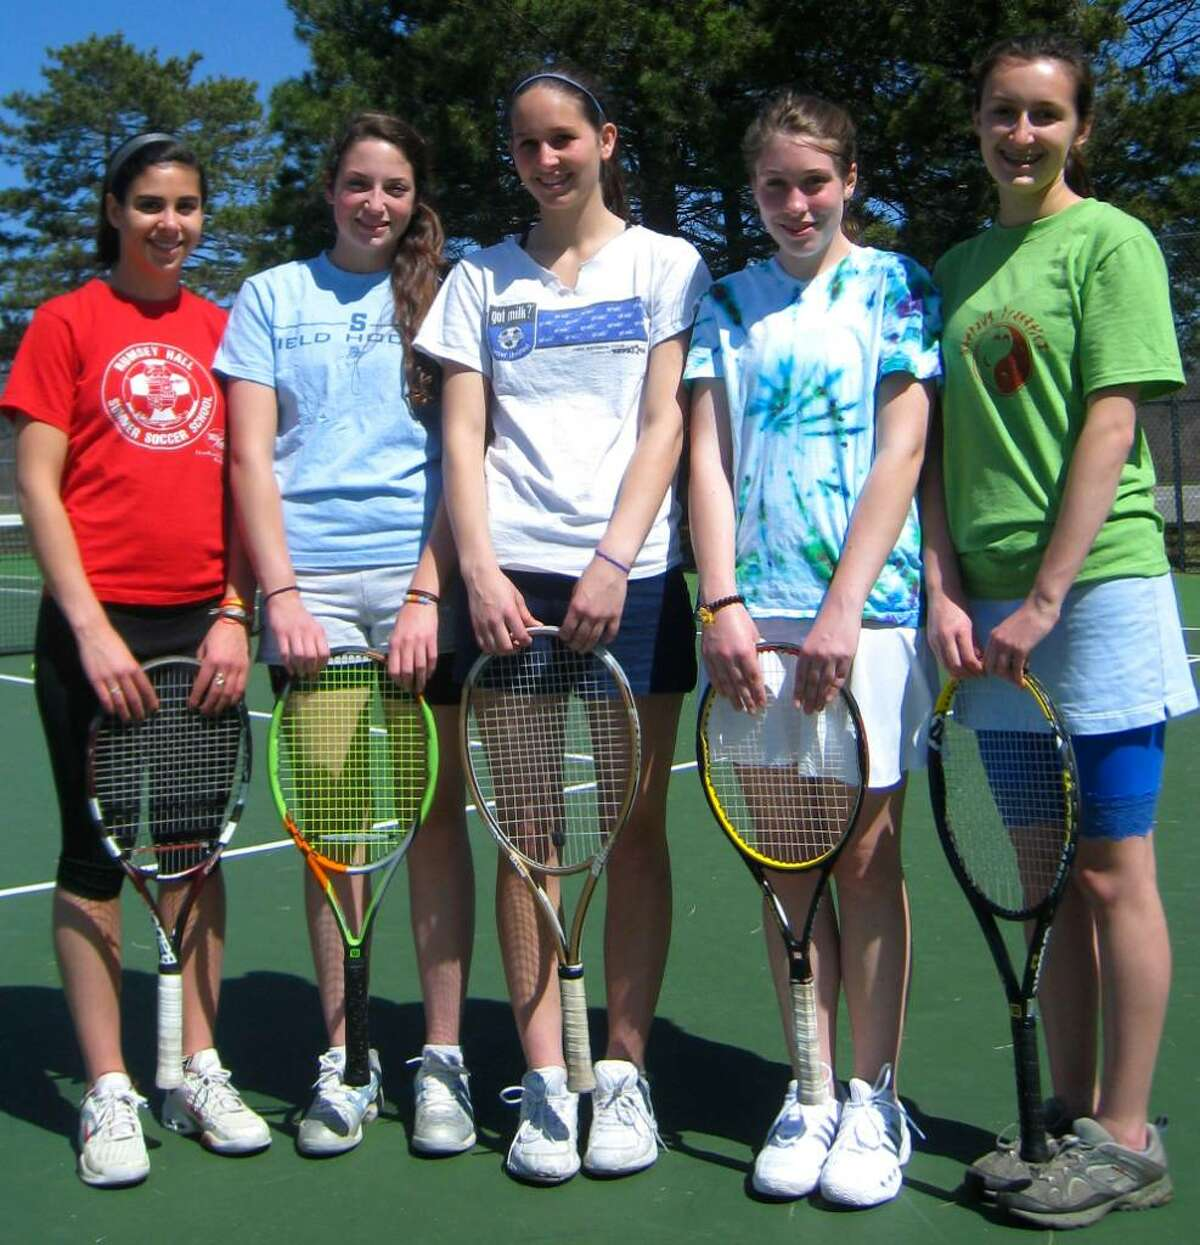 SPECTRUM/Shepaug Valley High School girls' tennis has five senior captains, from left to right, Samantha Metcalf, Hannah Loeb, Marina Scanlon, Catherine Wolk and Charlotte McConaghy. April 2, 2010.